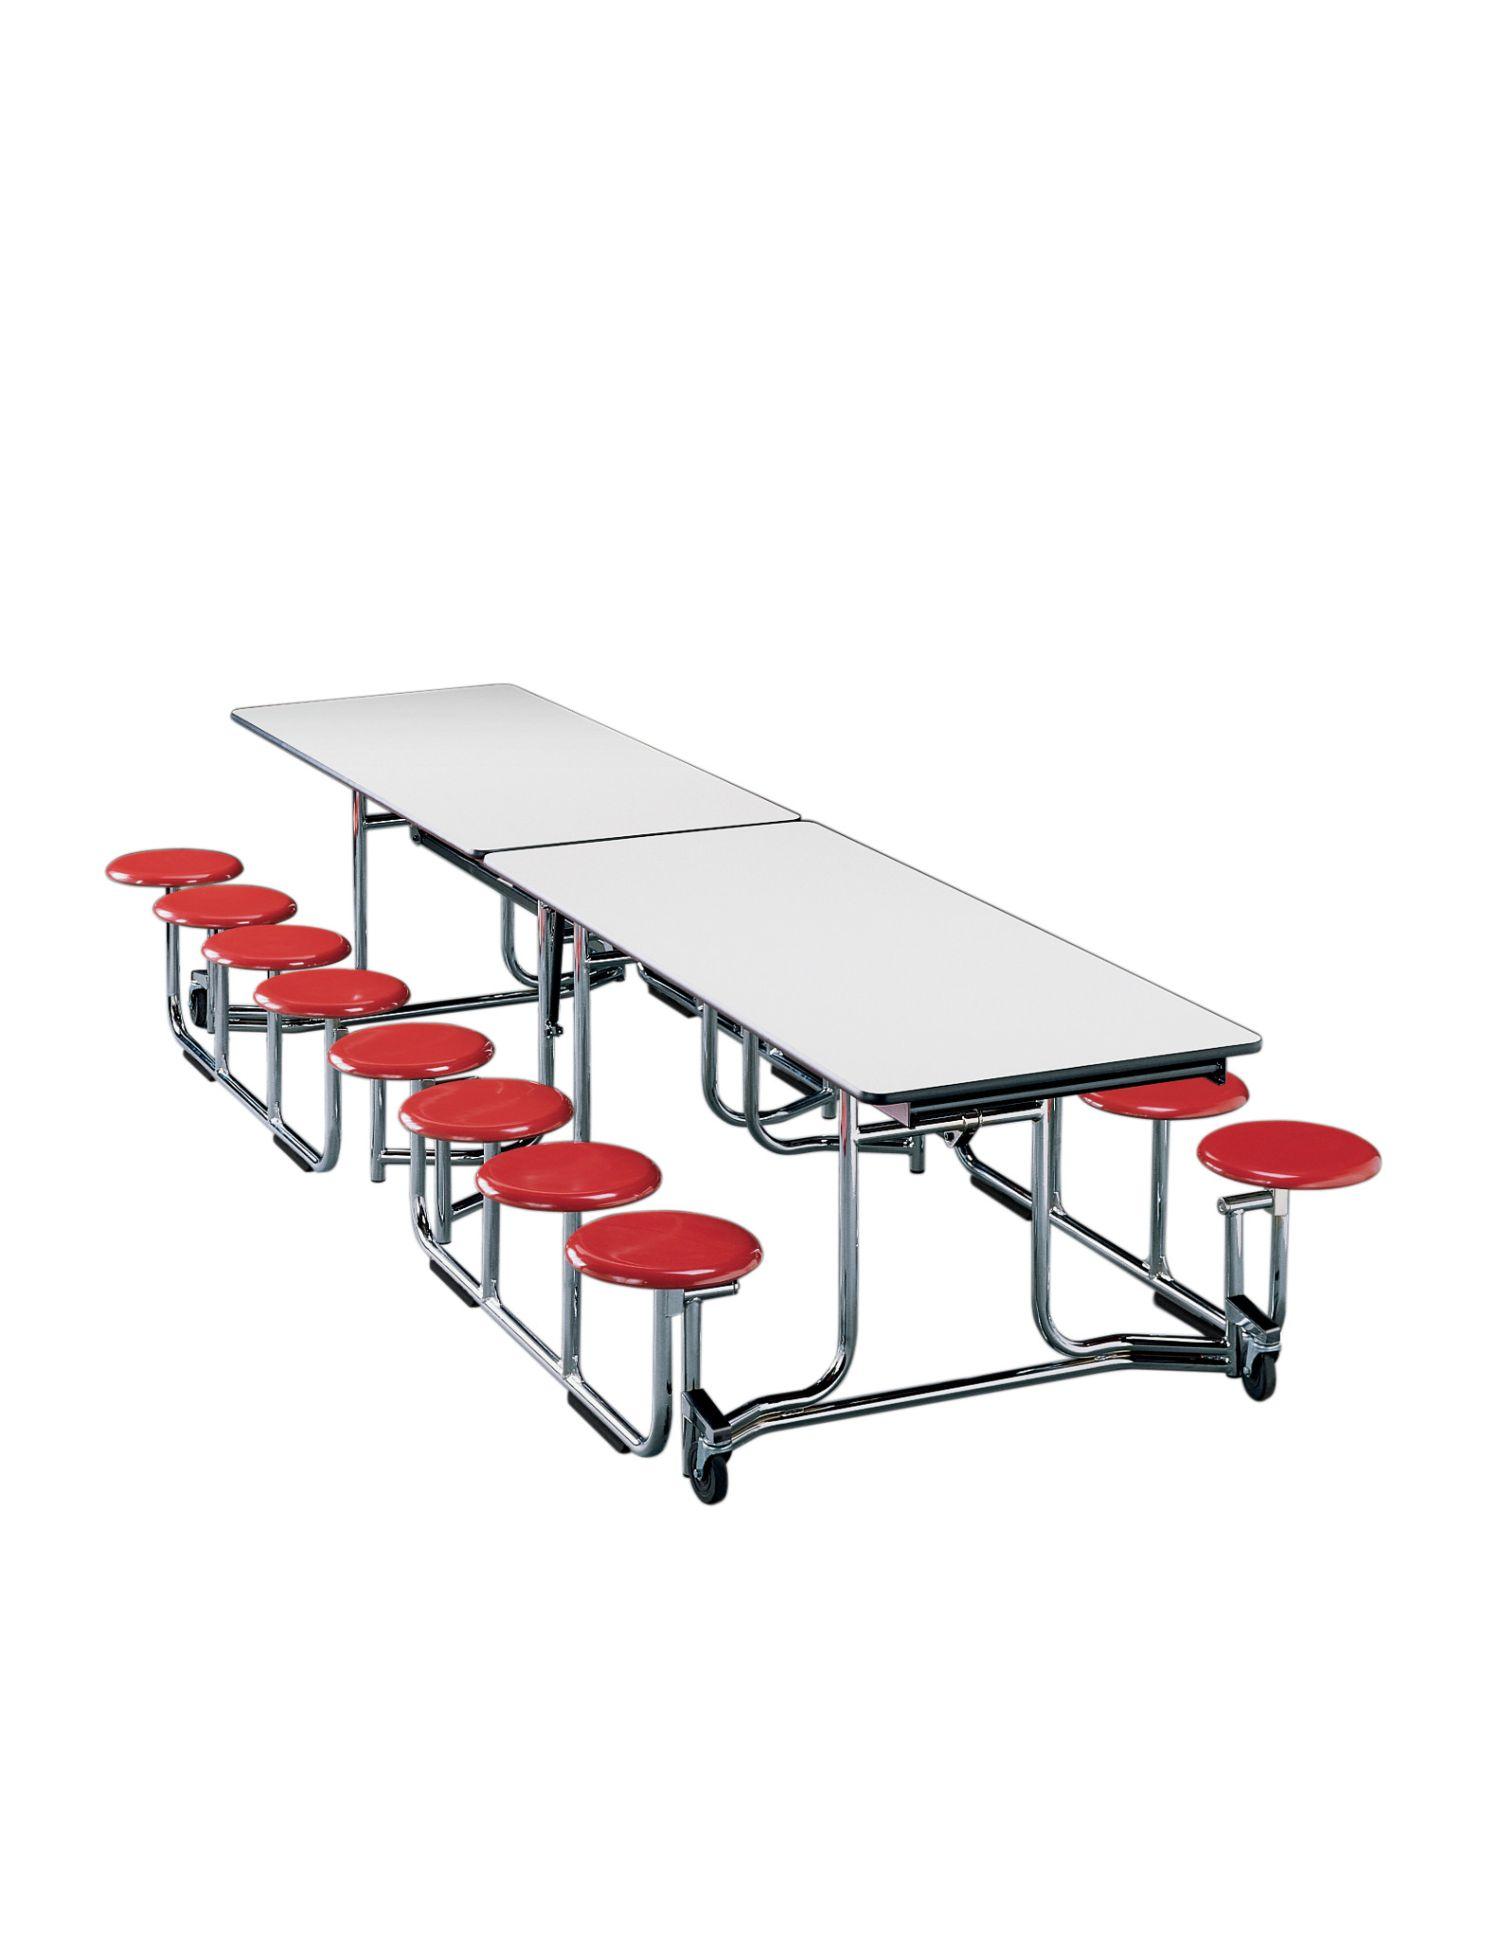 uniframe_stools_16_u